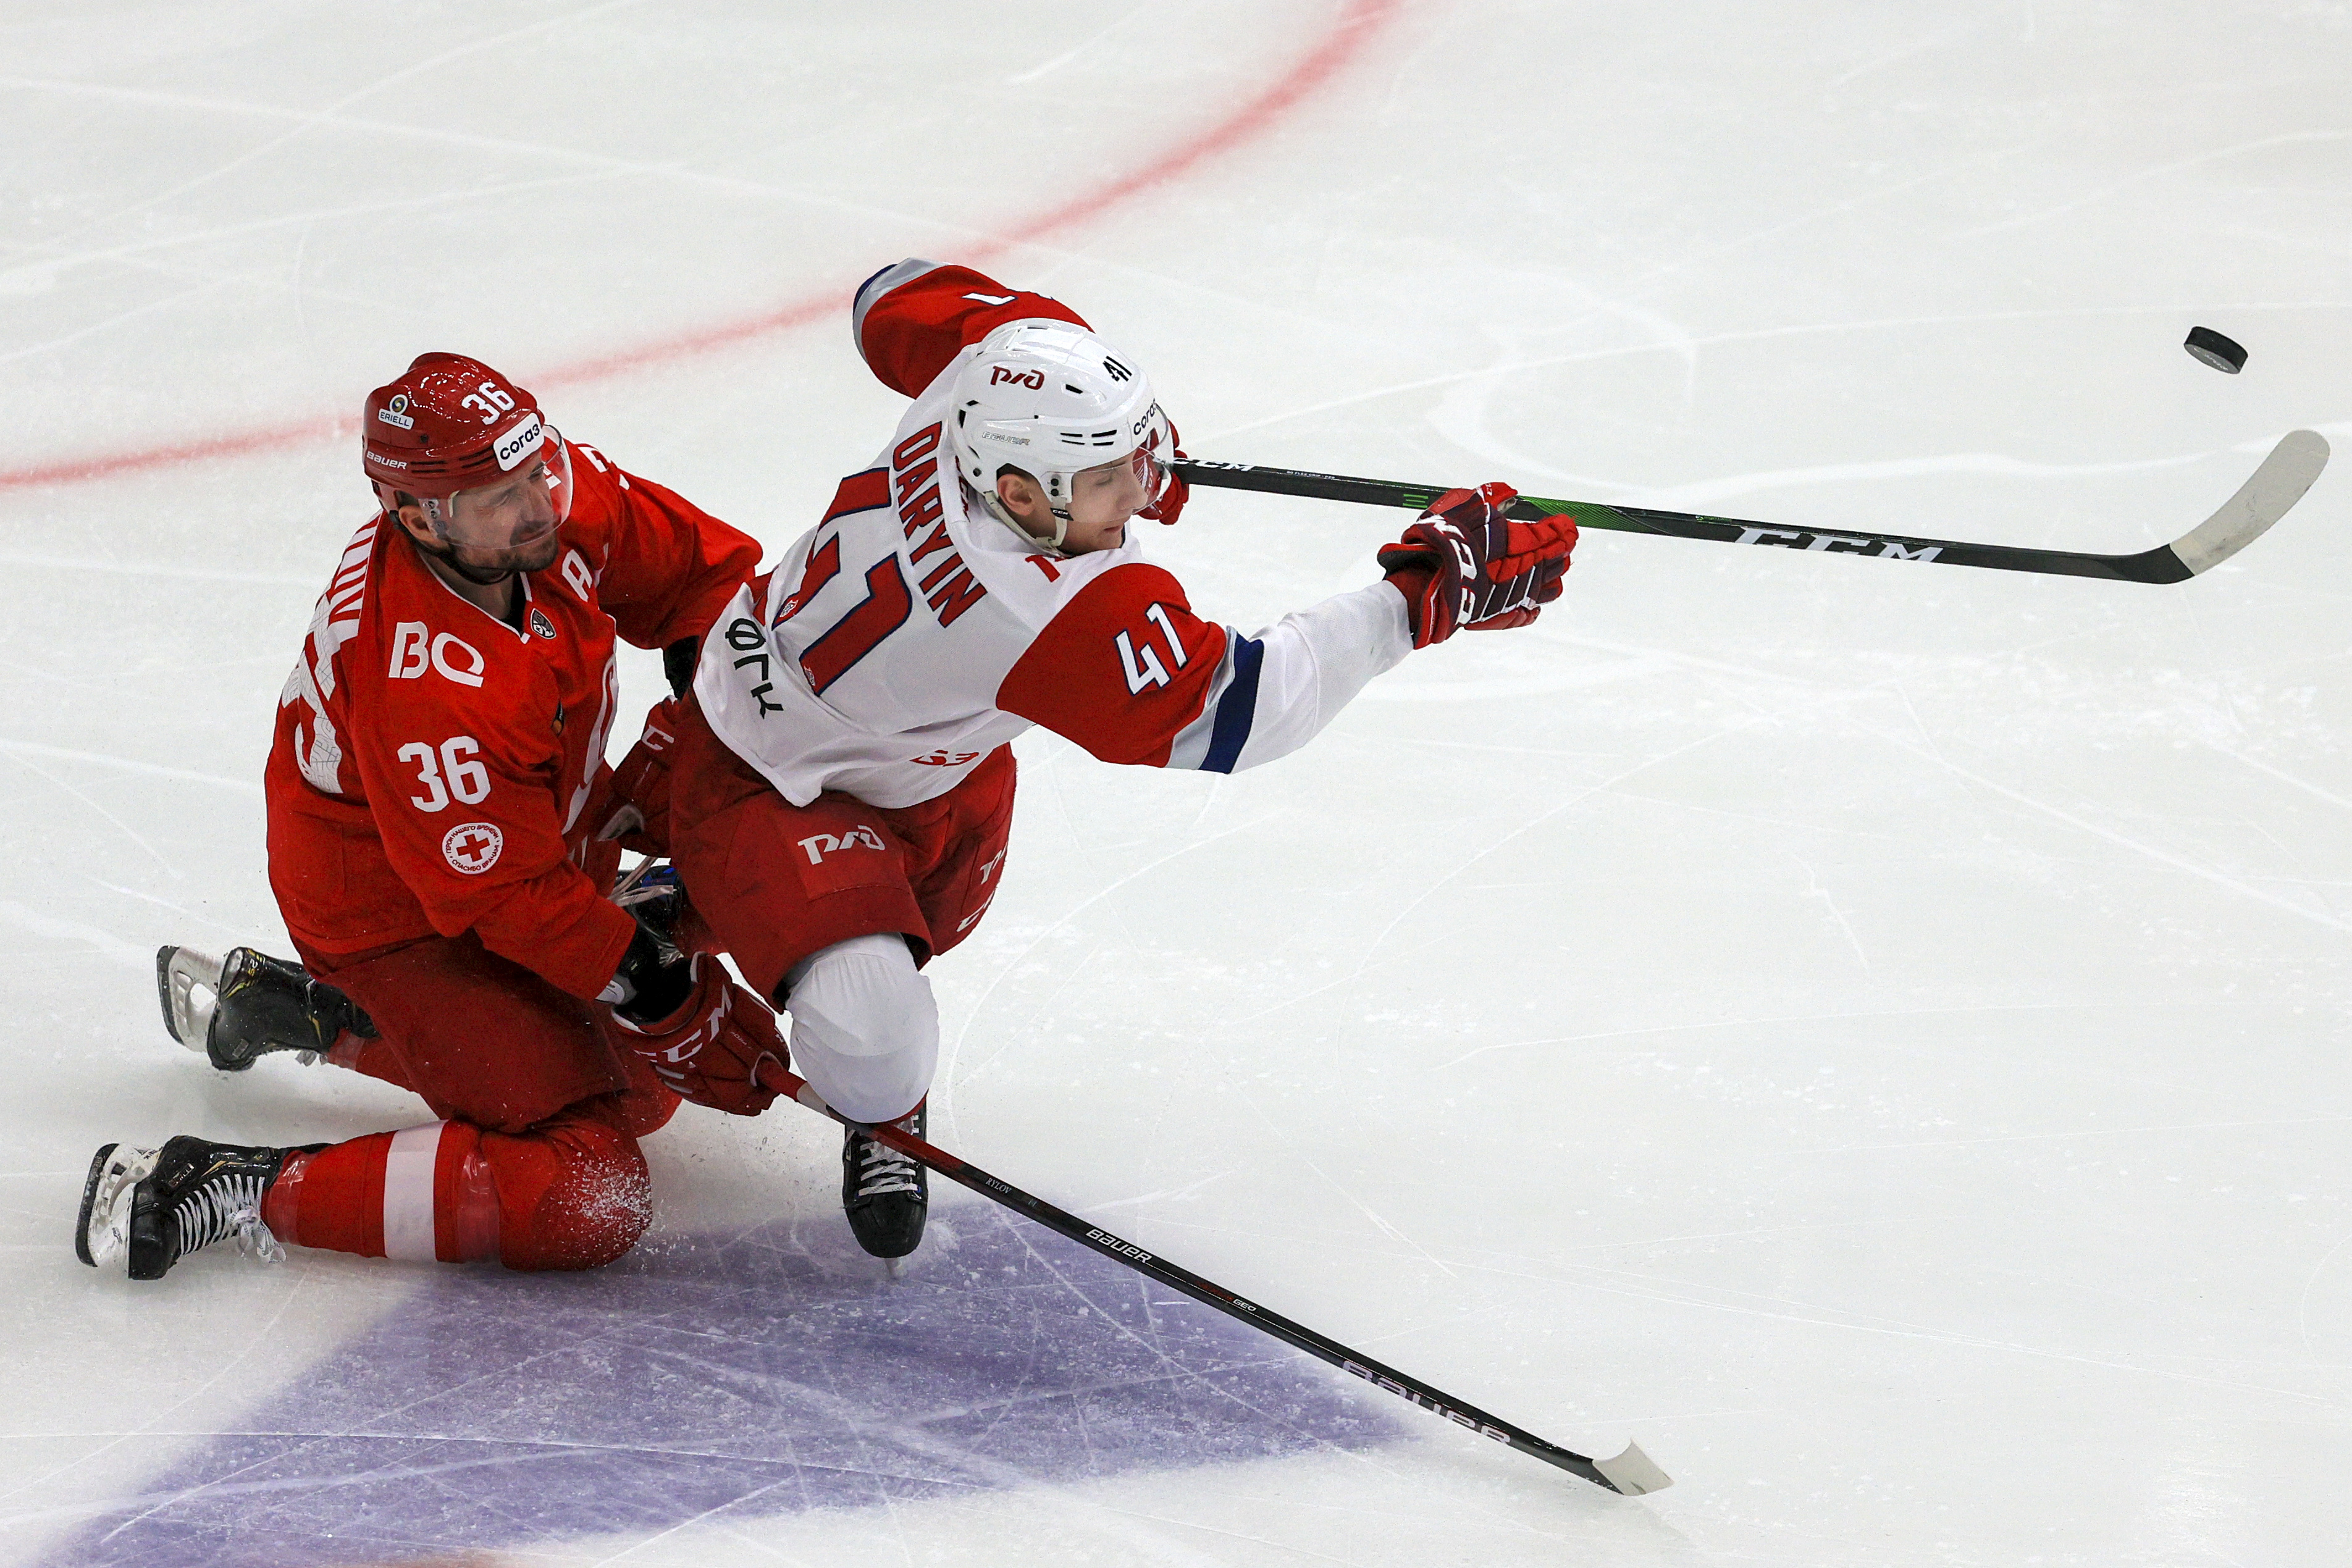 Kontinental Hockey League: Spartak Moscow vs Lokomotiv Yaroslavl